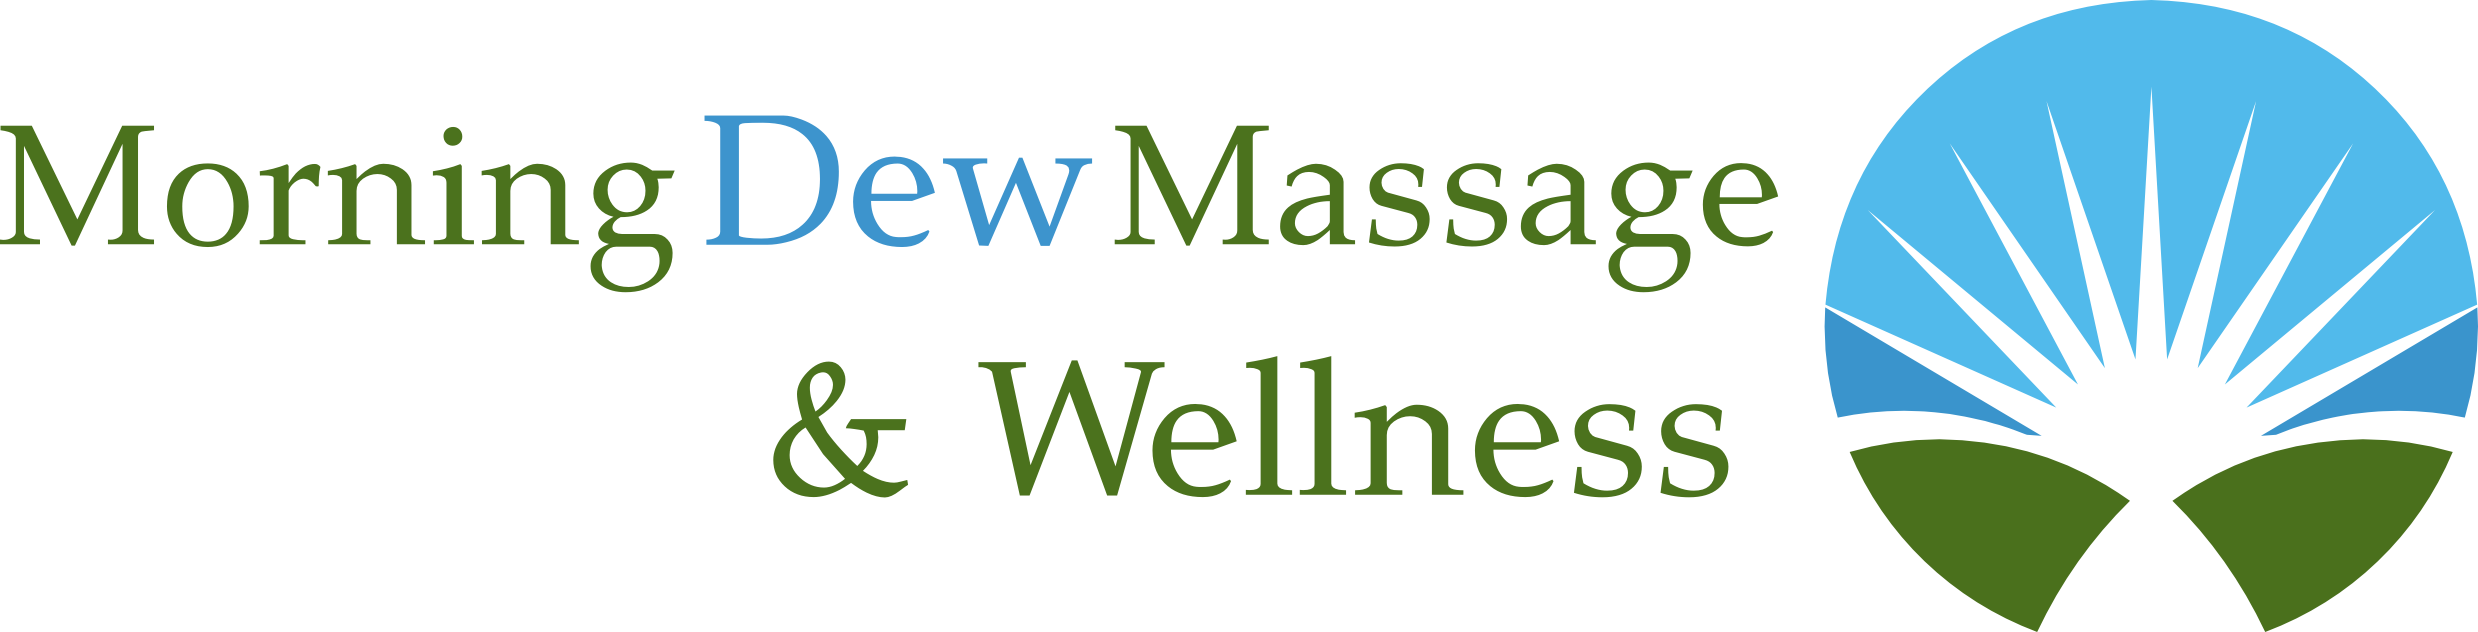 Morning Dew Massage & Wellness